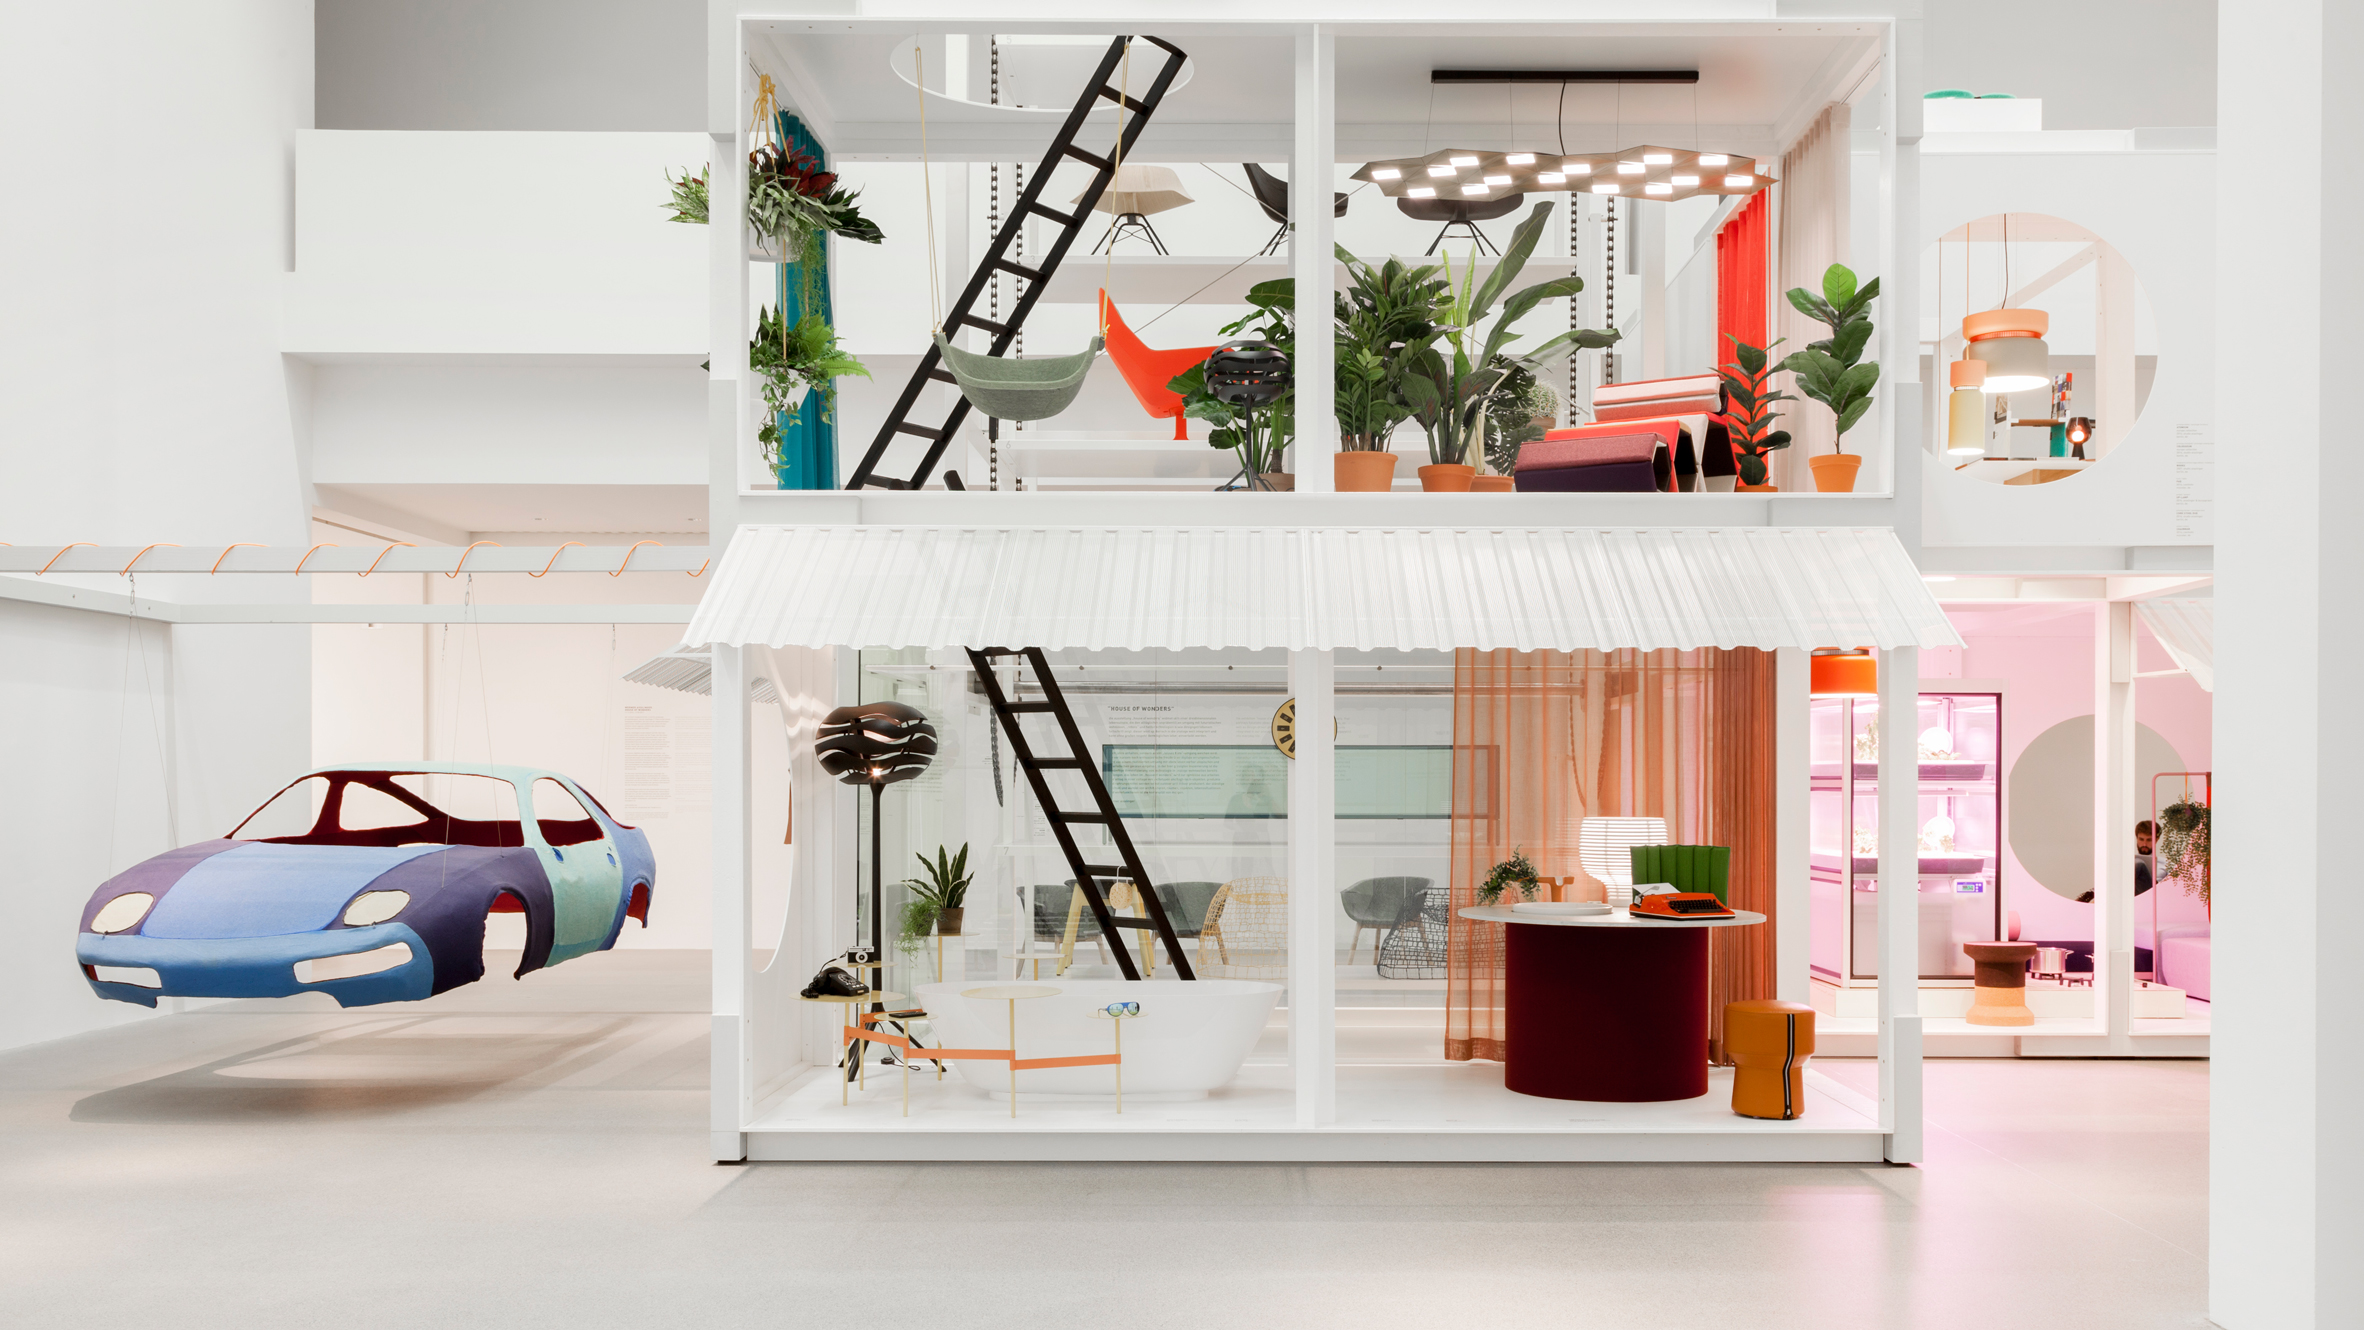 Werner Aisslinger Werner Aisslinger's House of Wonders exhibition cover 7